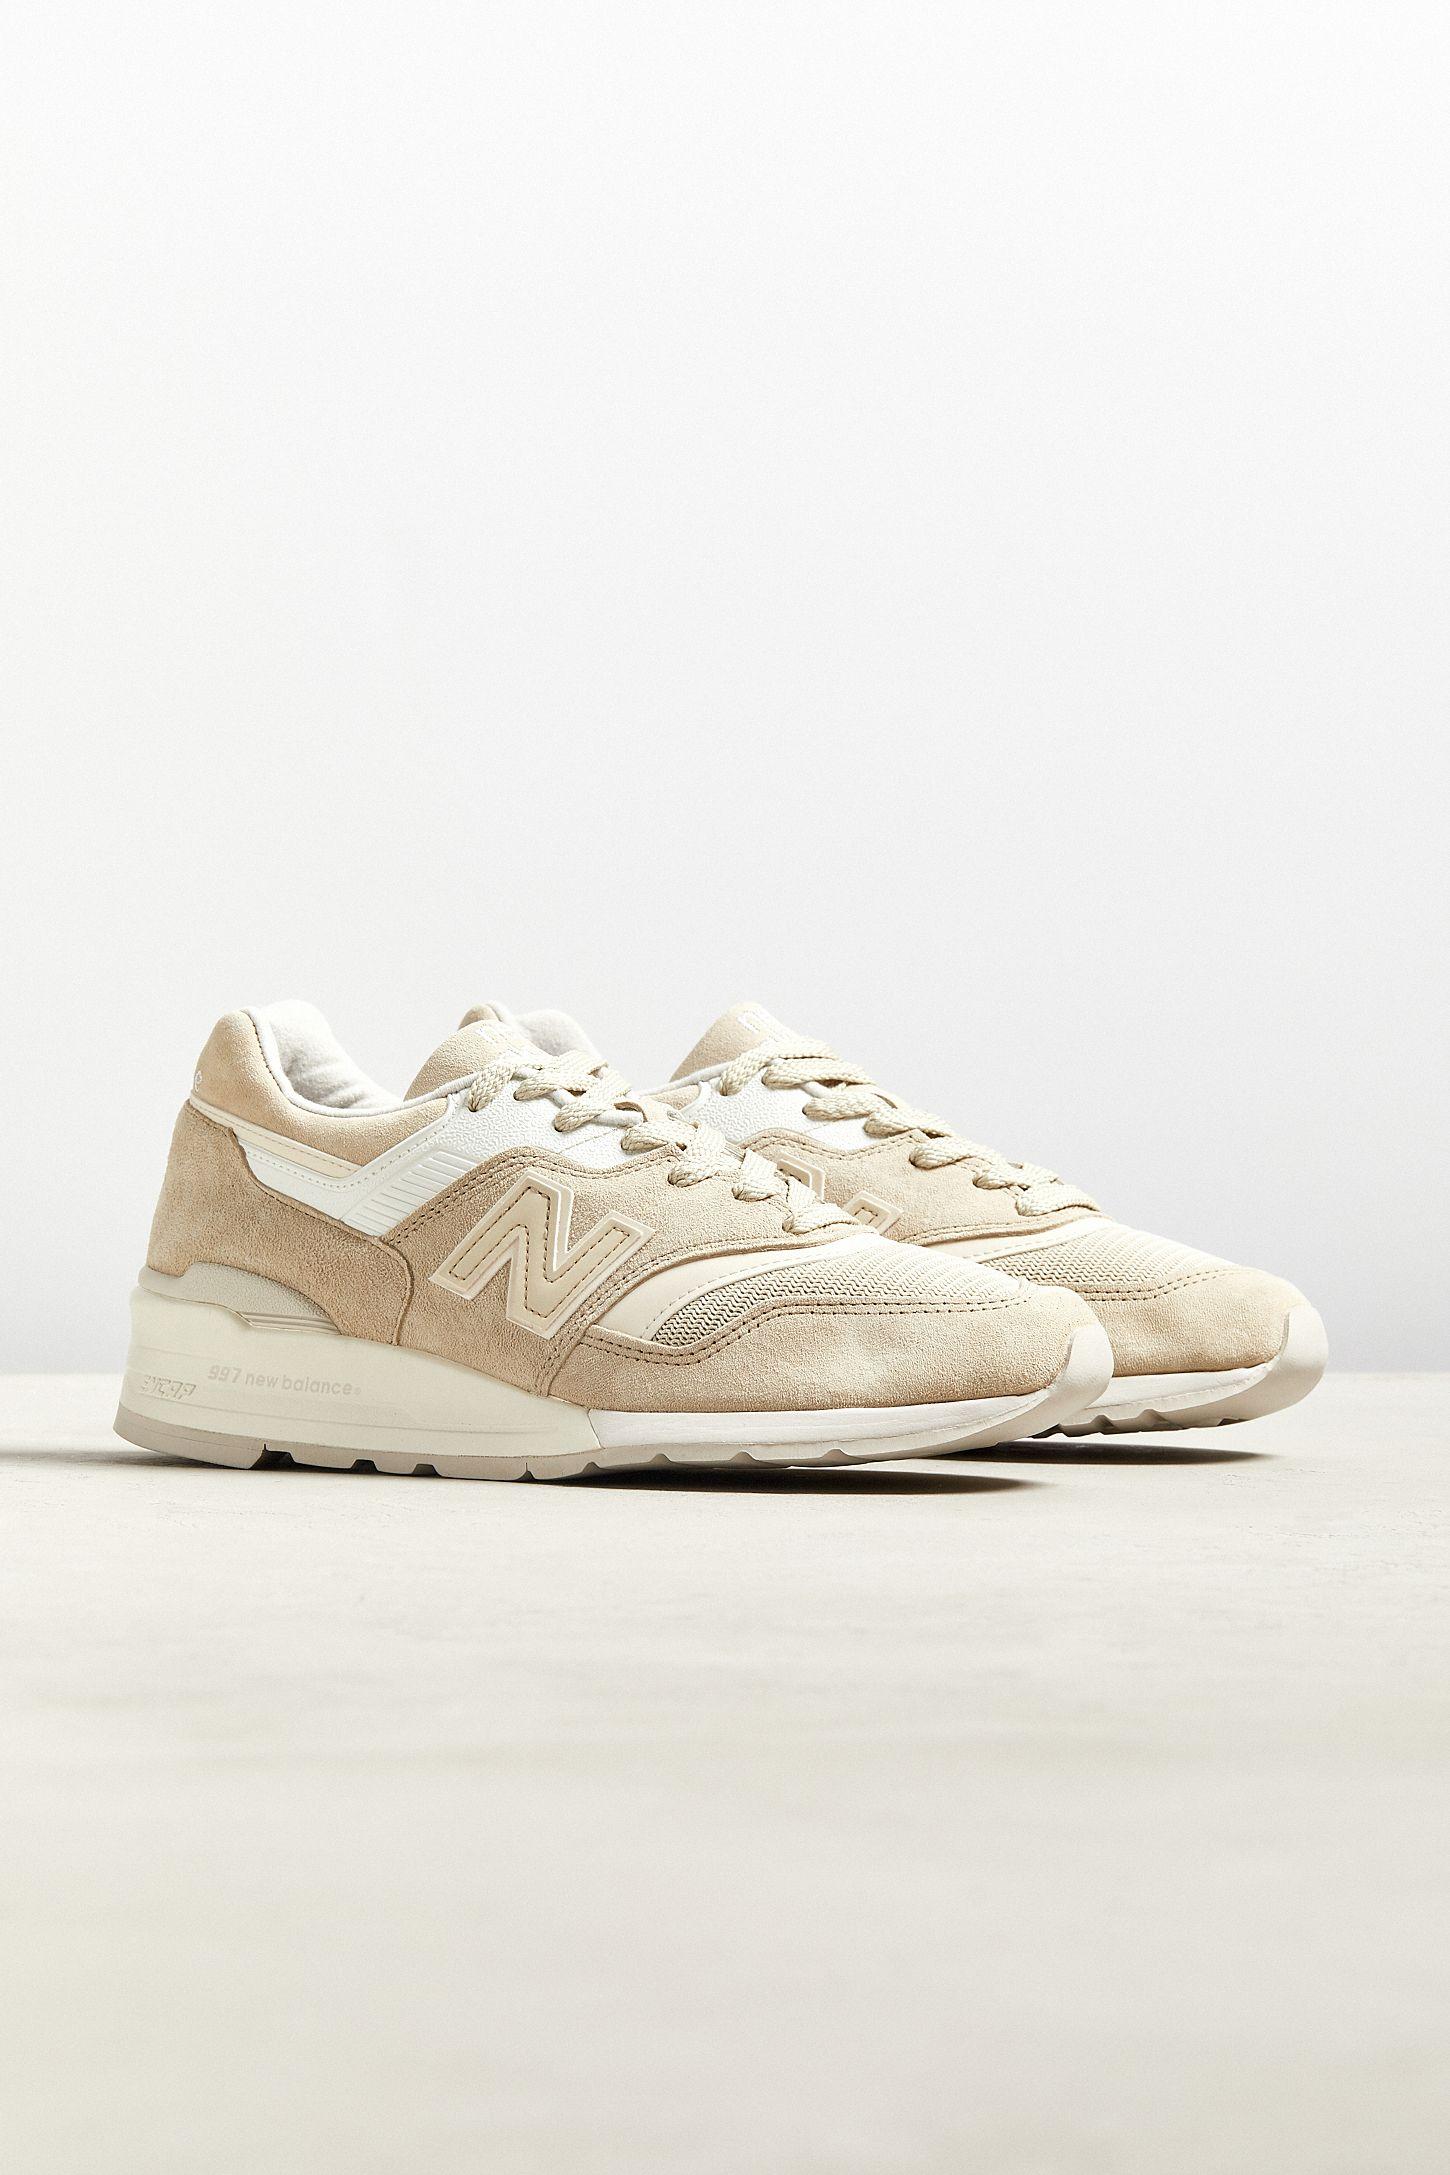 new arrivals 1c066 7a2f8 New Balance 997 Sneaker